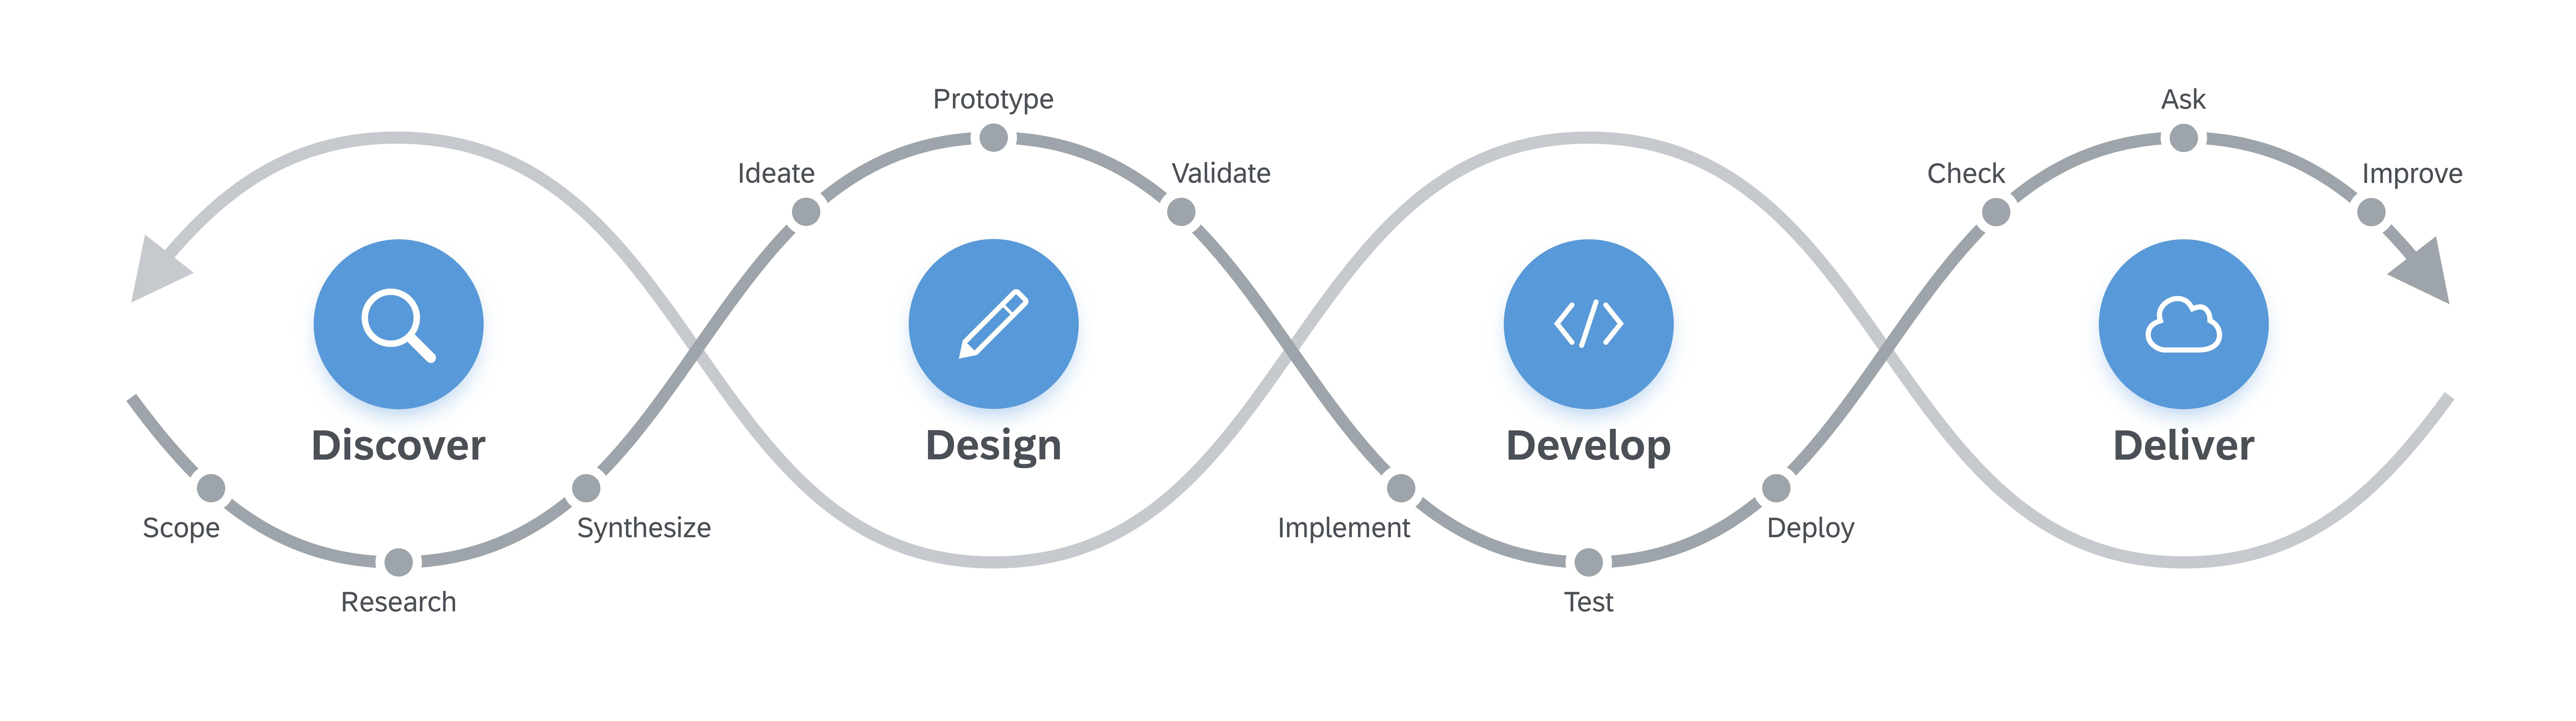 Design%20Led%20Development%20Process